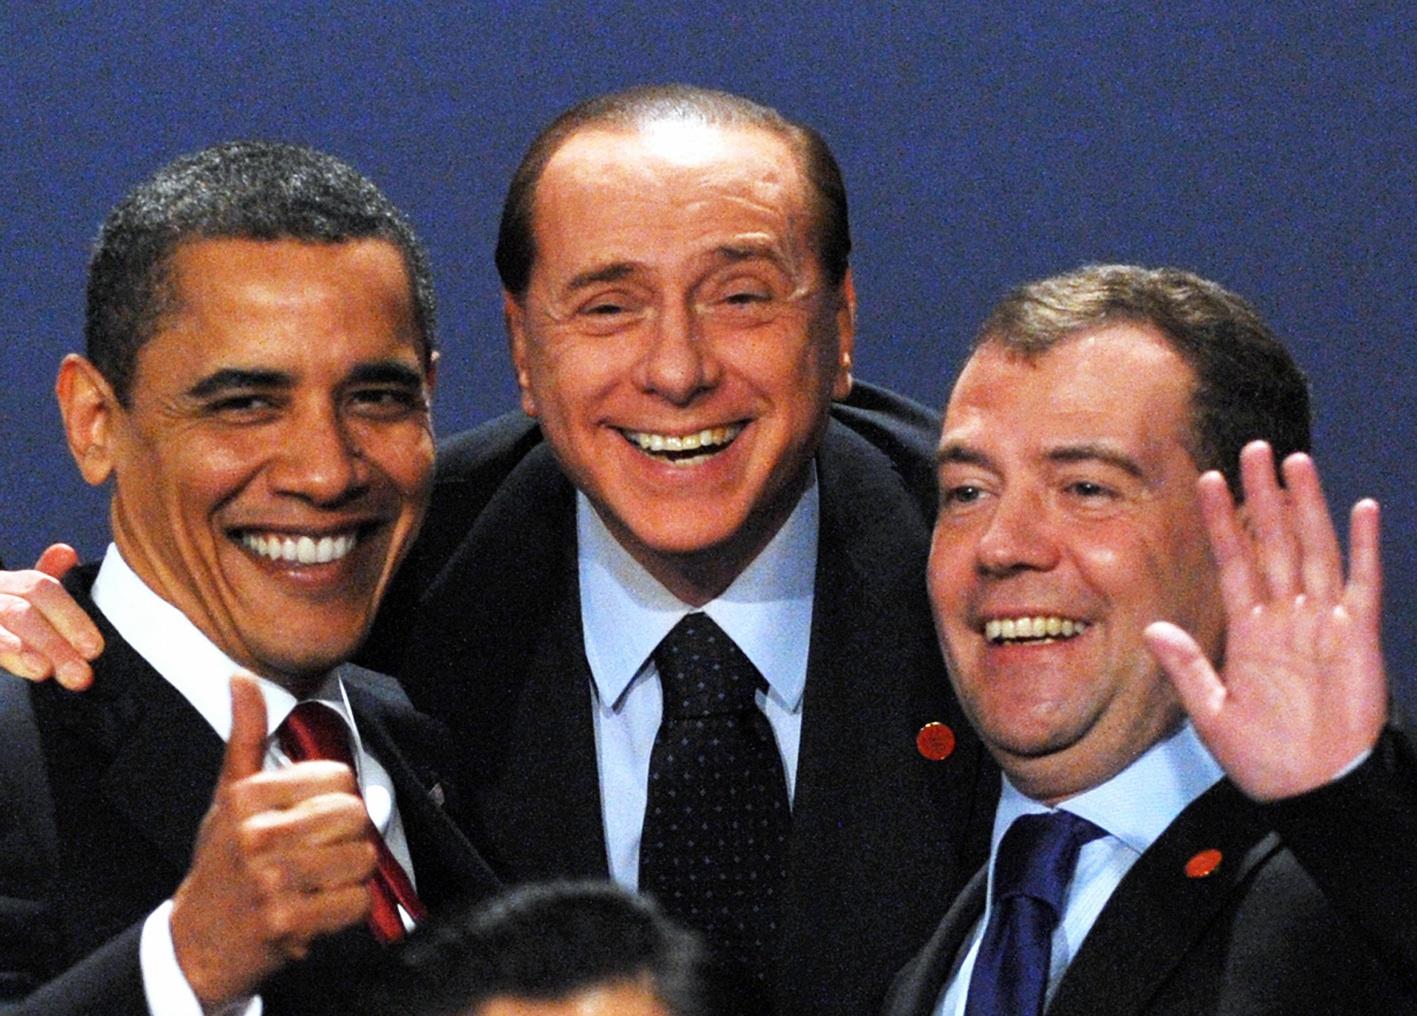 Вротмненоги, G20 6 арбузов 3